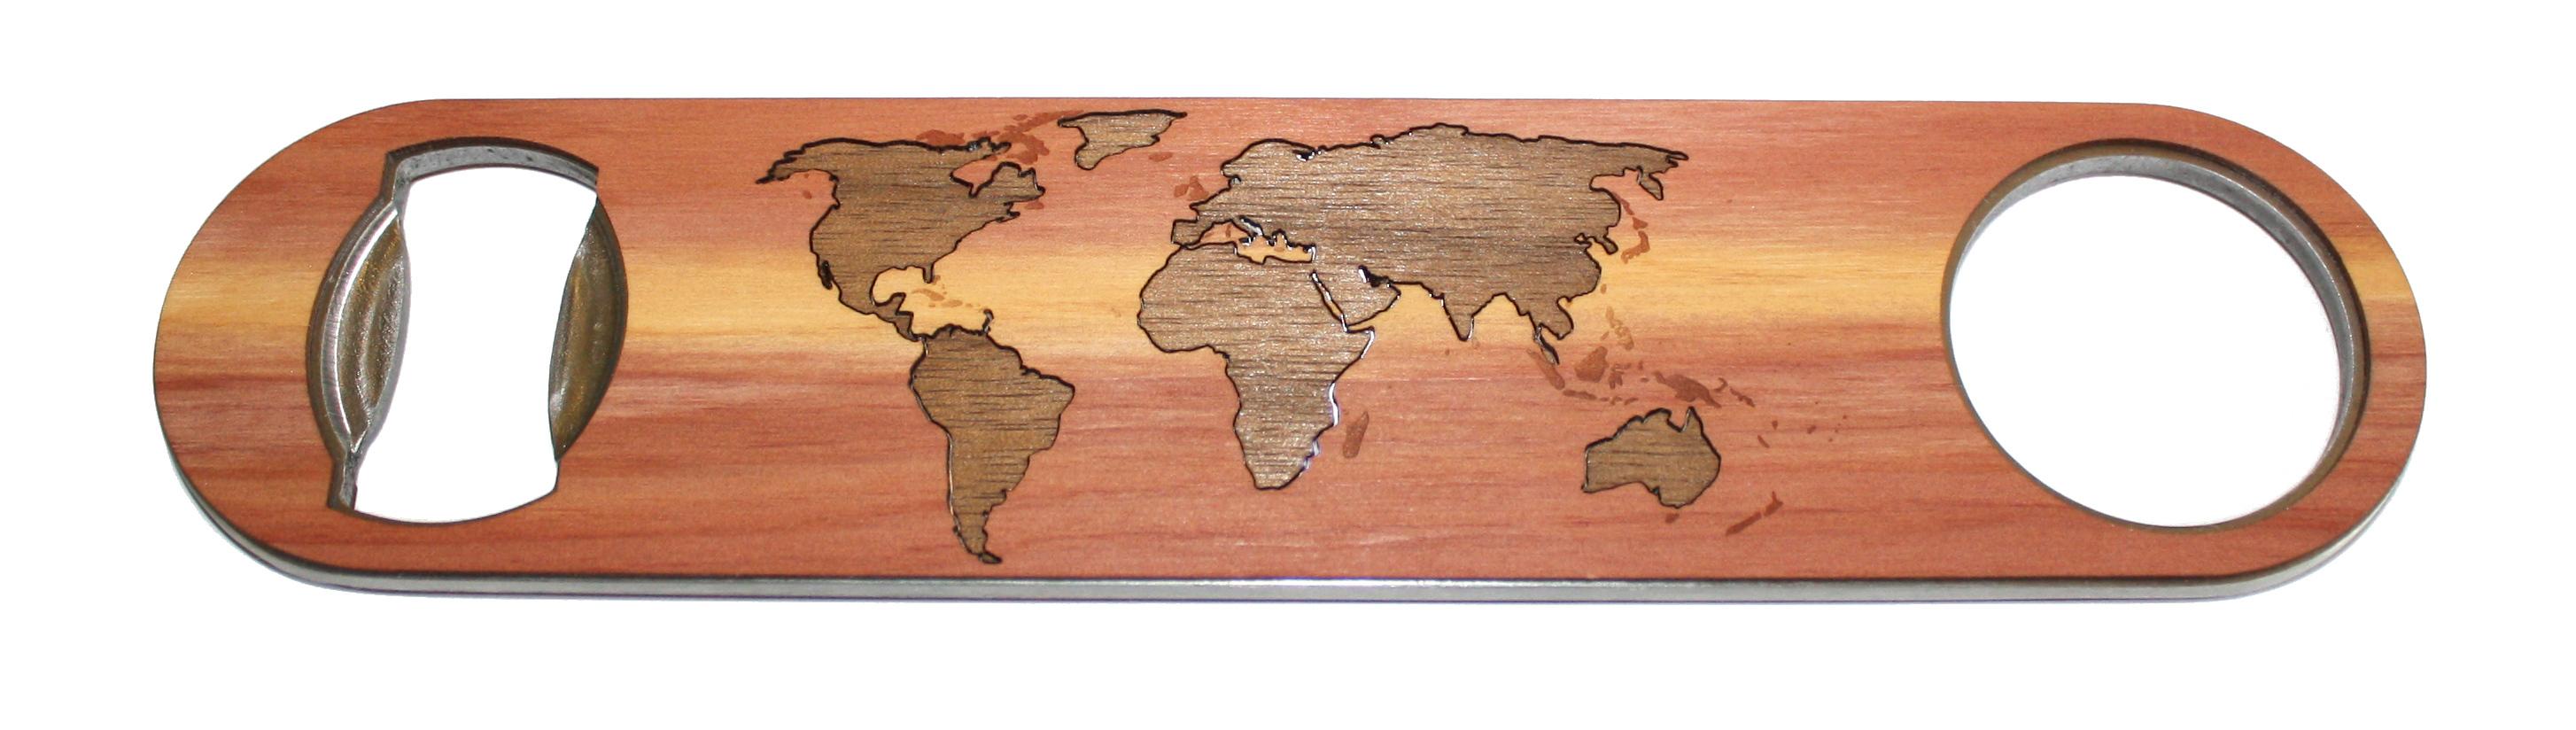 2 wood inlay example world map on bottle opener